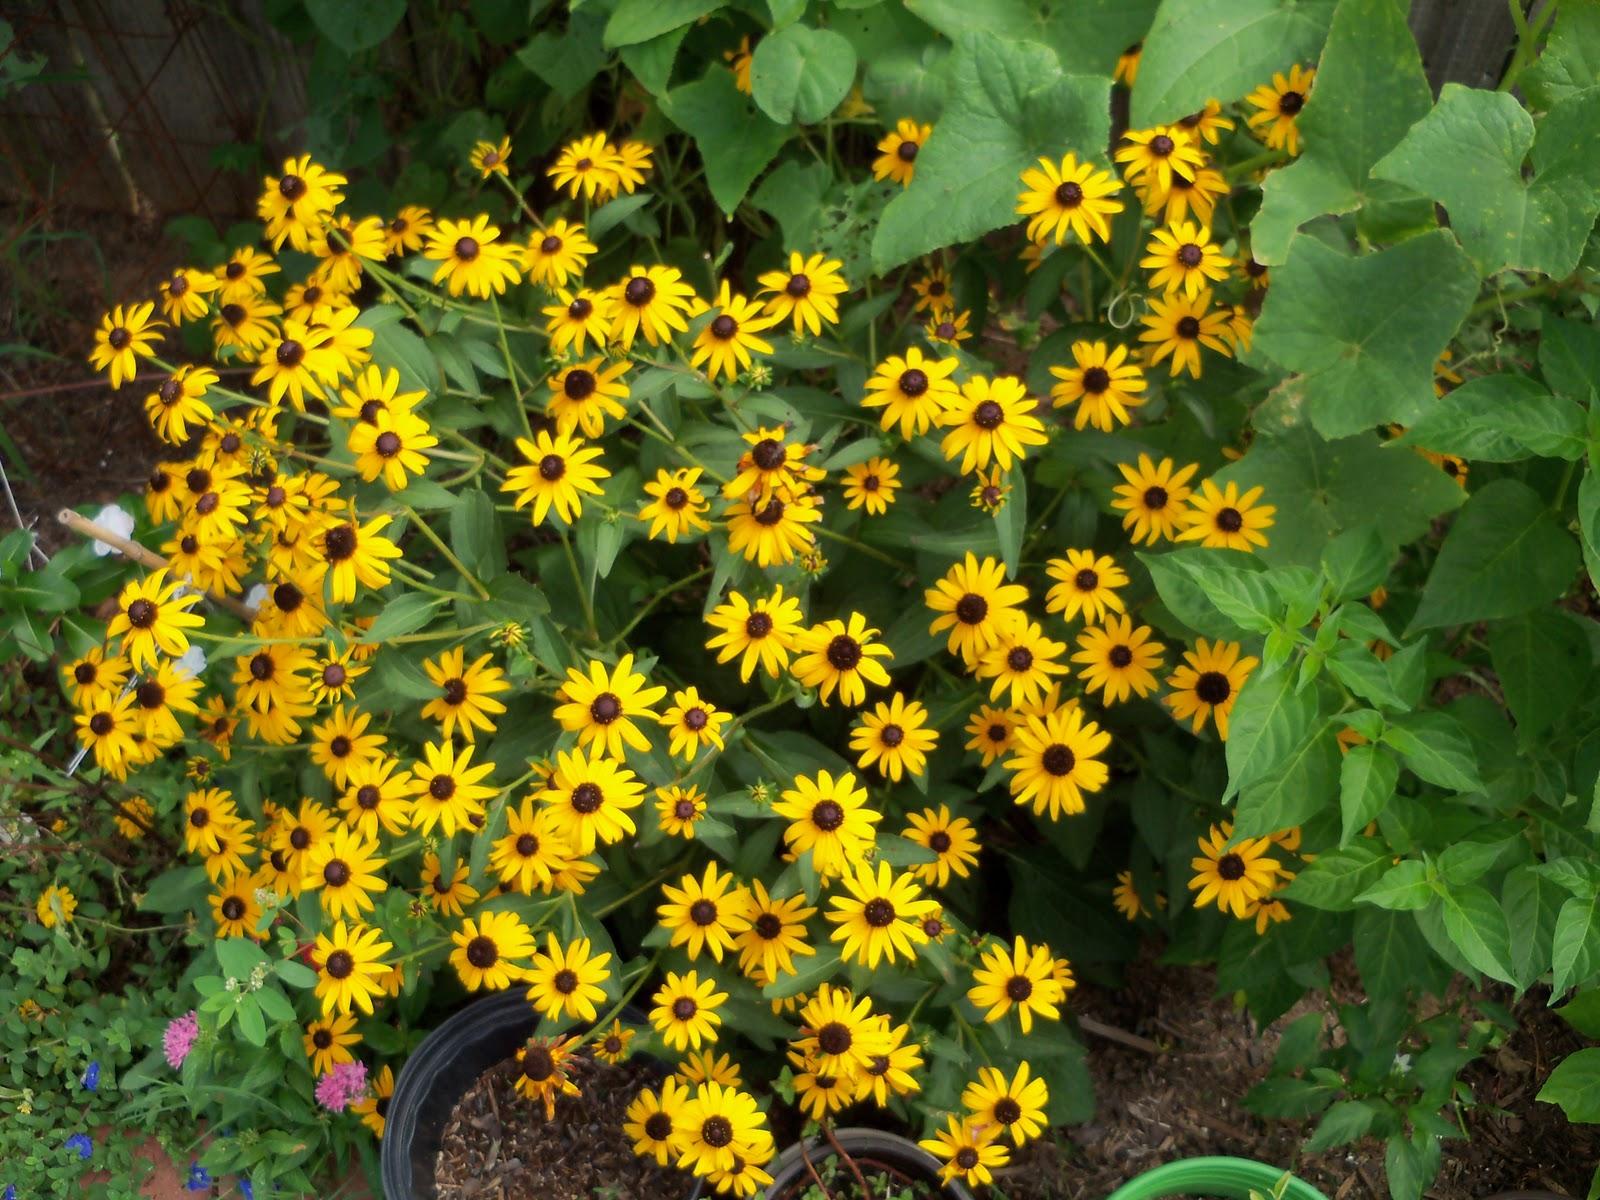 Gardening 2010, Part Three - 101_5239.JPG